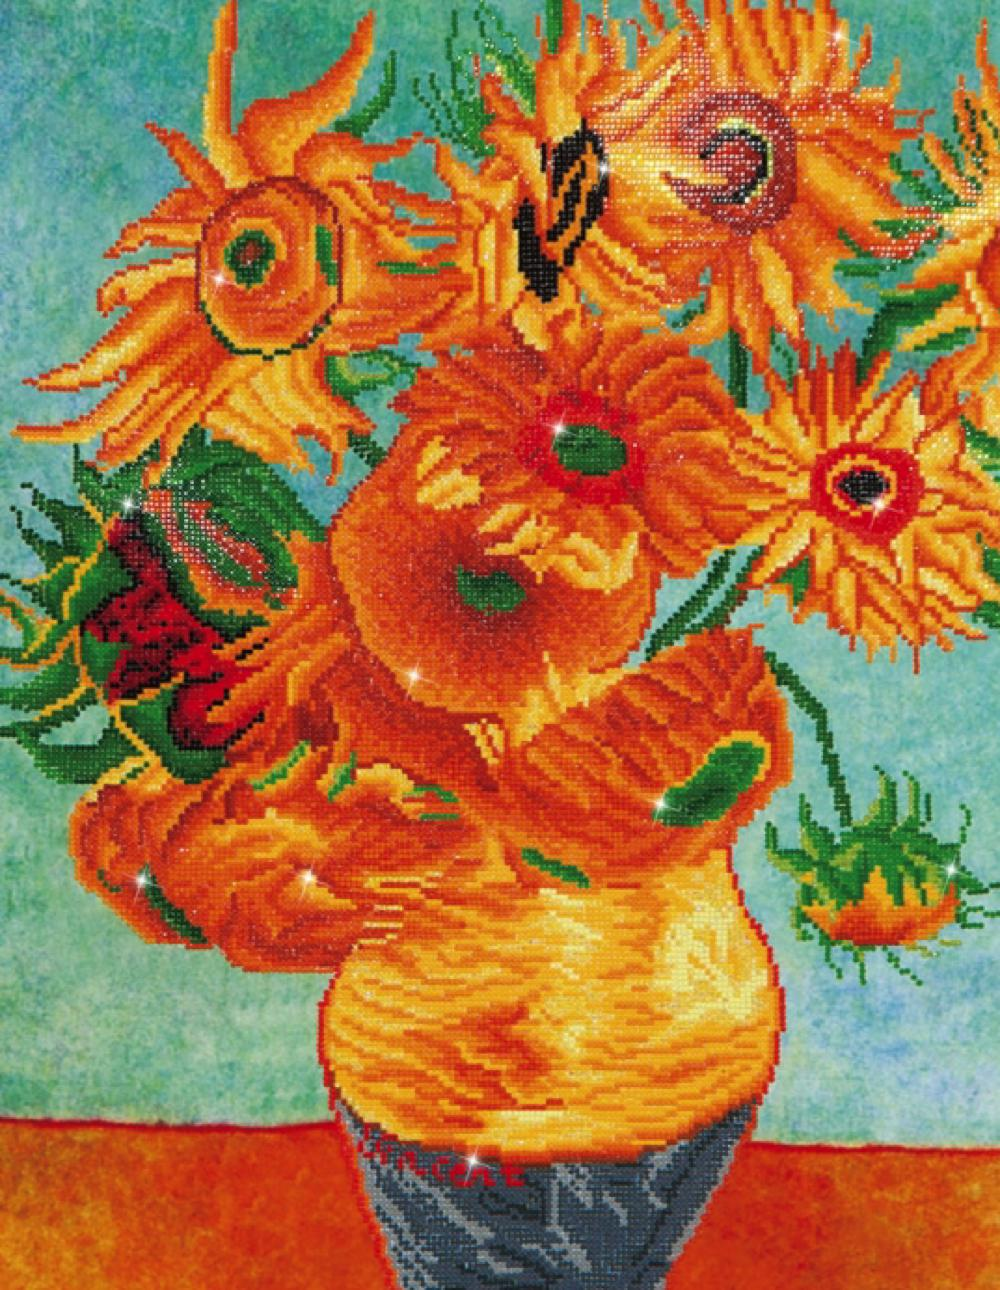 Diamond Dotz - Sunflowers (Van Gogh)